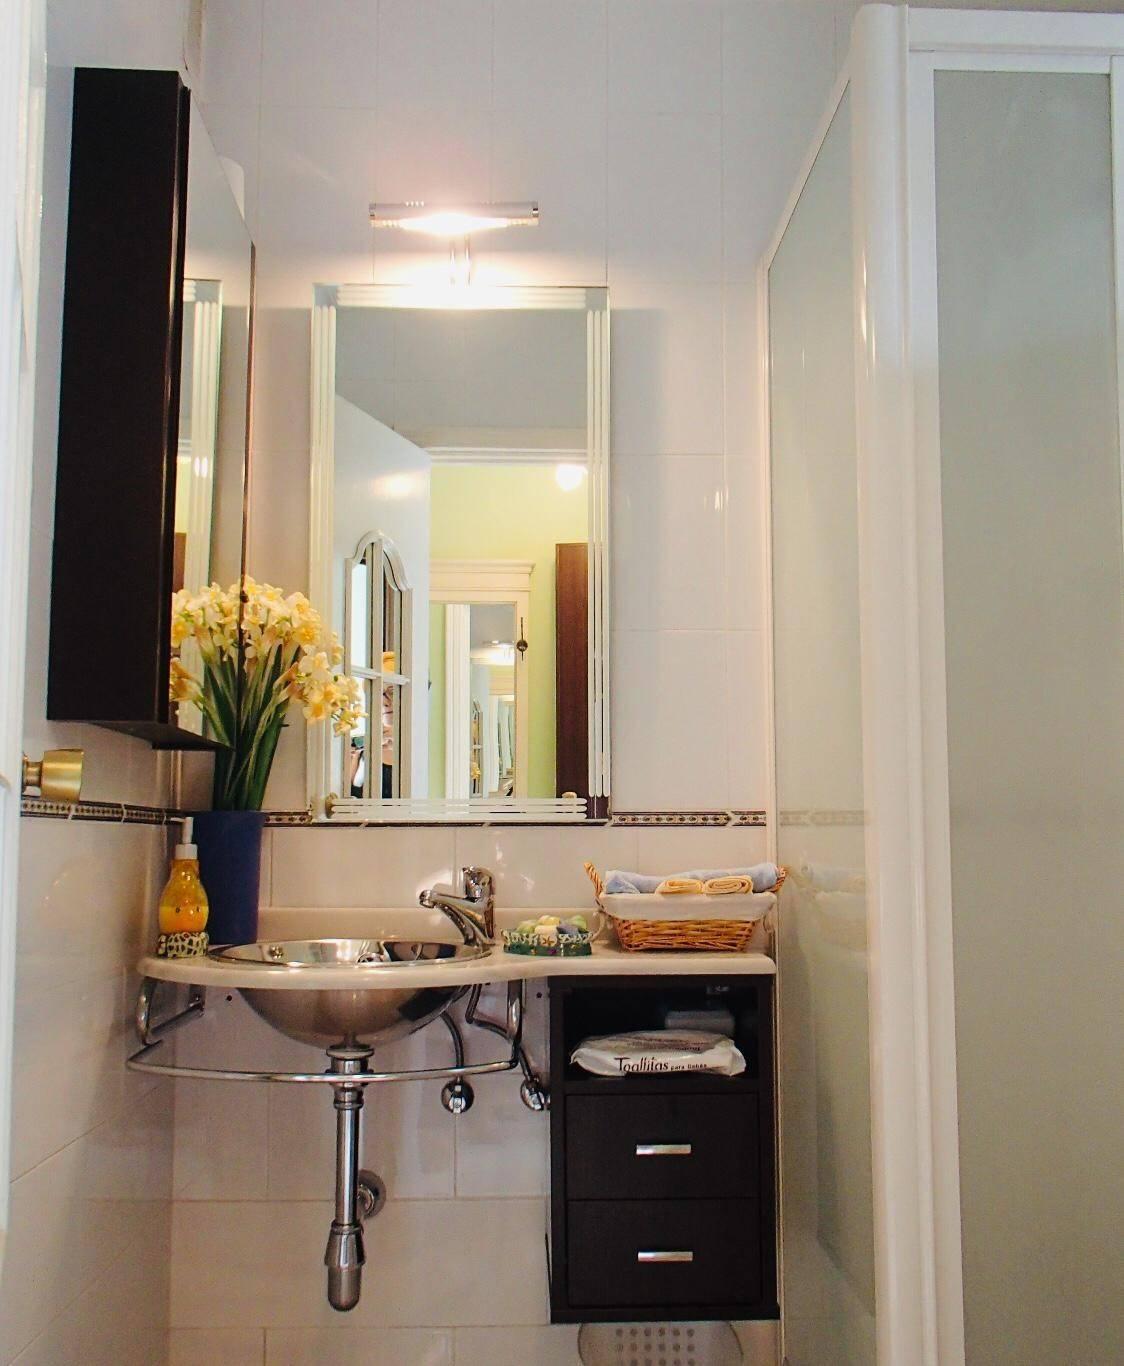 Particular alquila/vende preciosa casa adosada esquinera Coria del Rio  - Foto 6